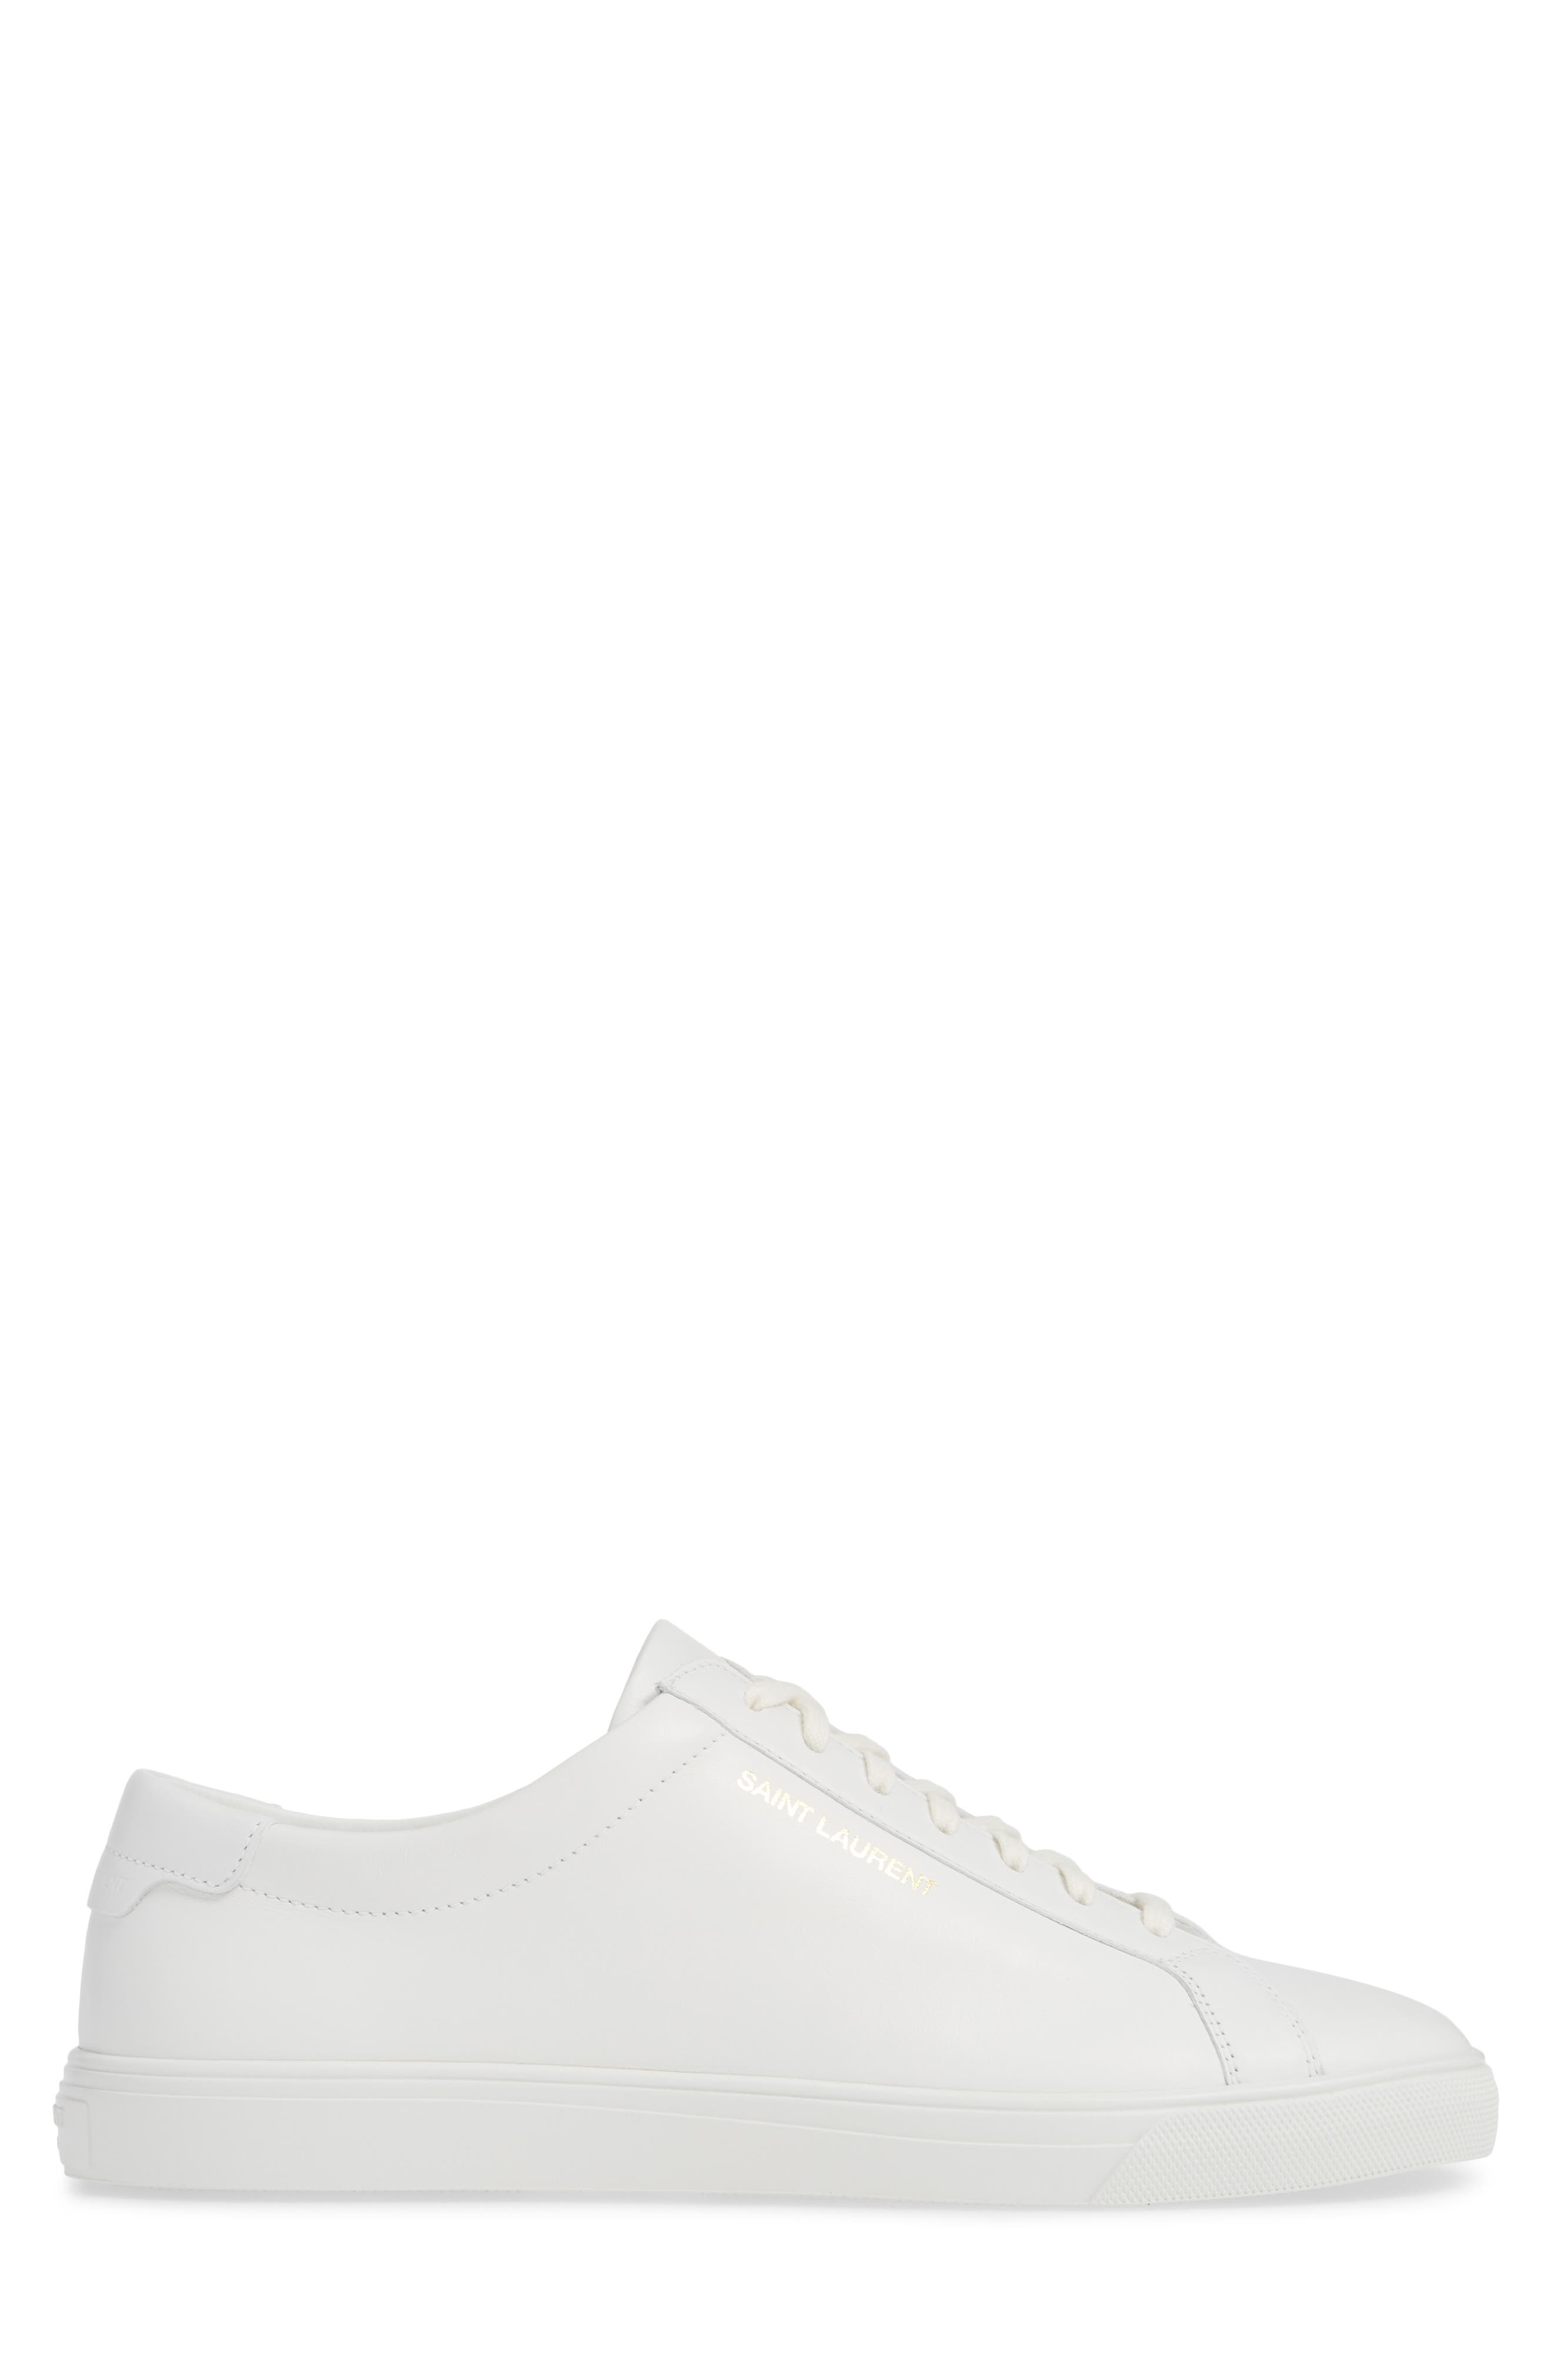 Andy Low Top Sneaker,                             Alternate thumbnail 3, color,                             BLANC OPTIQUE